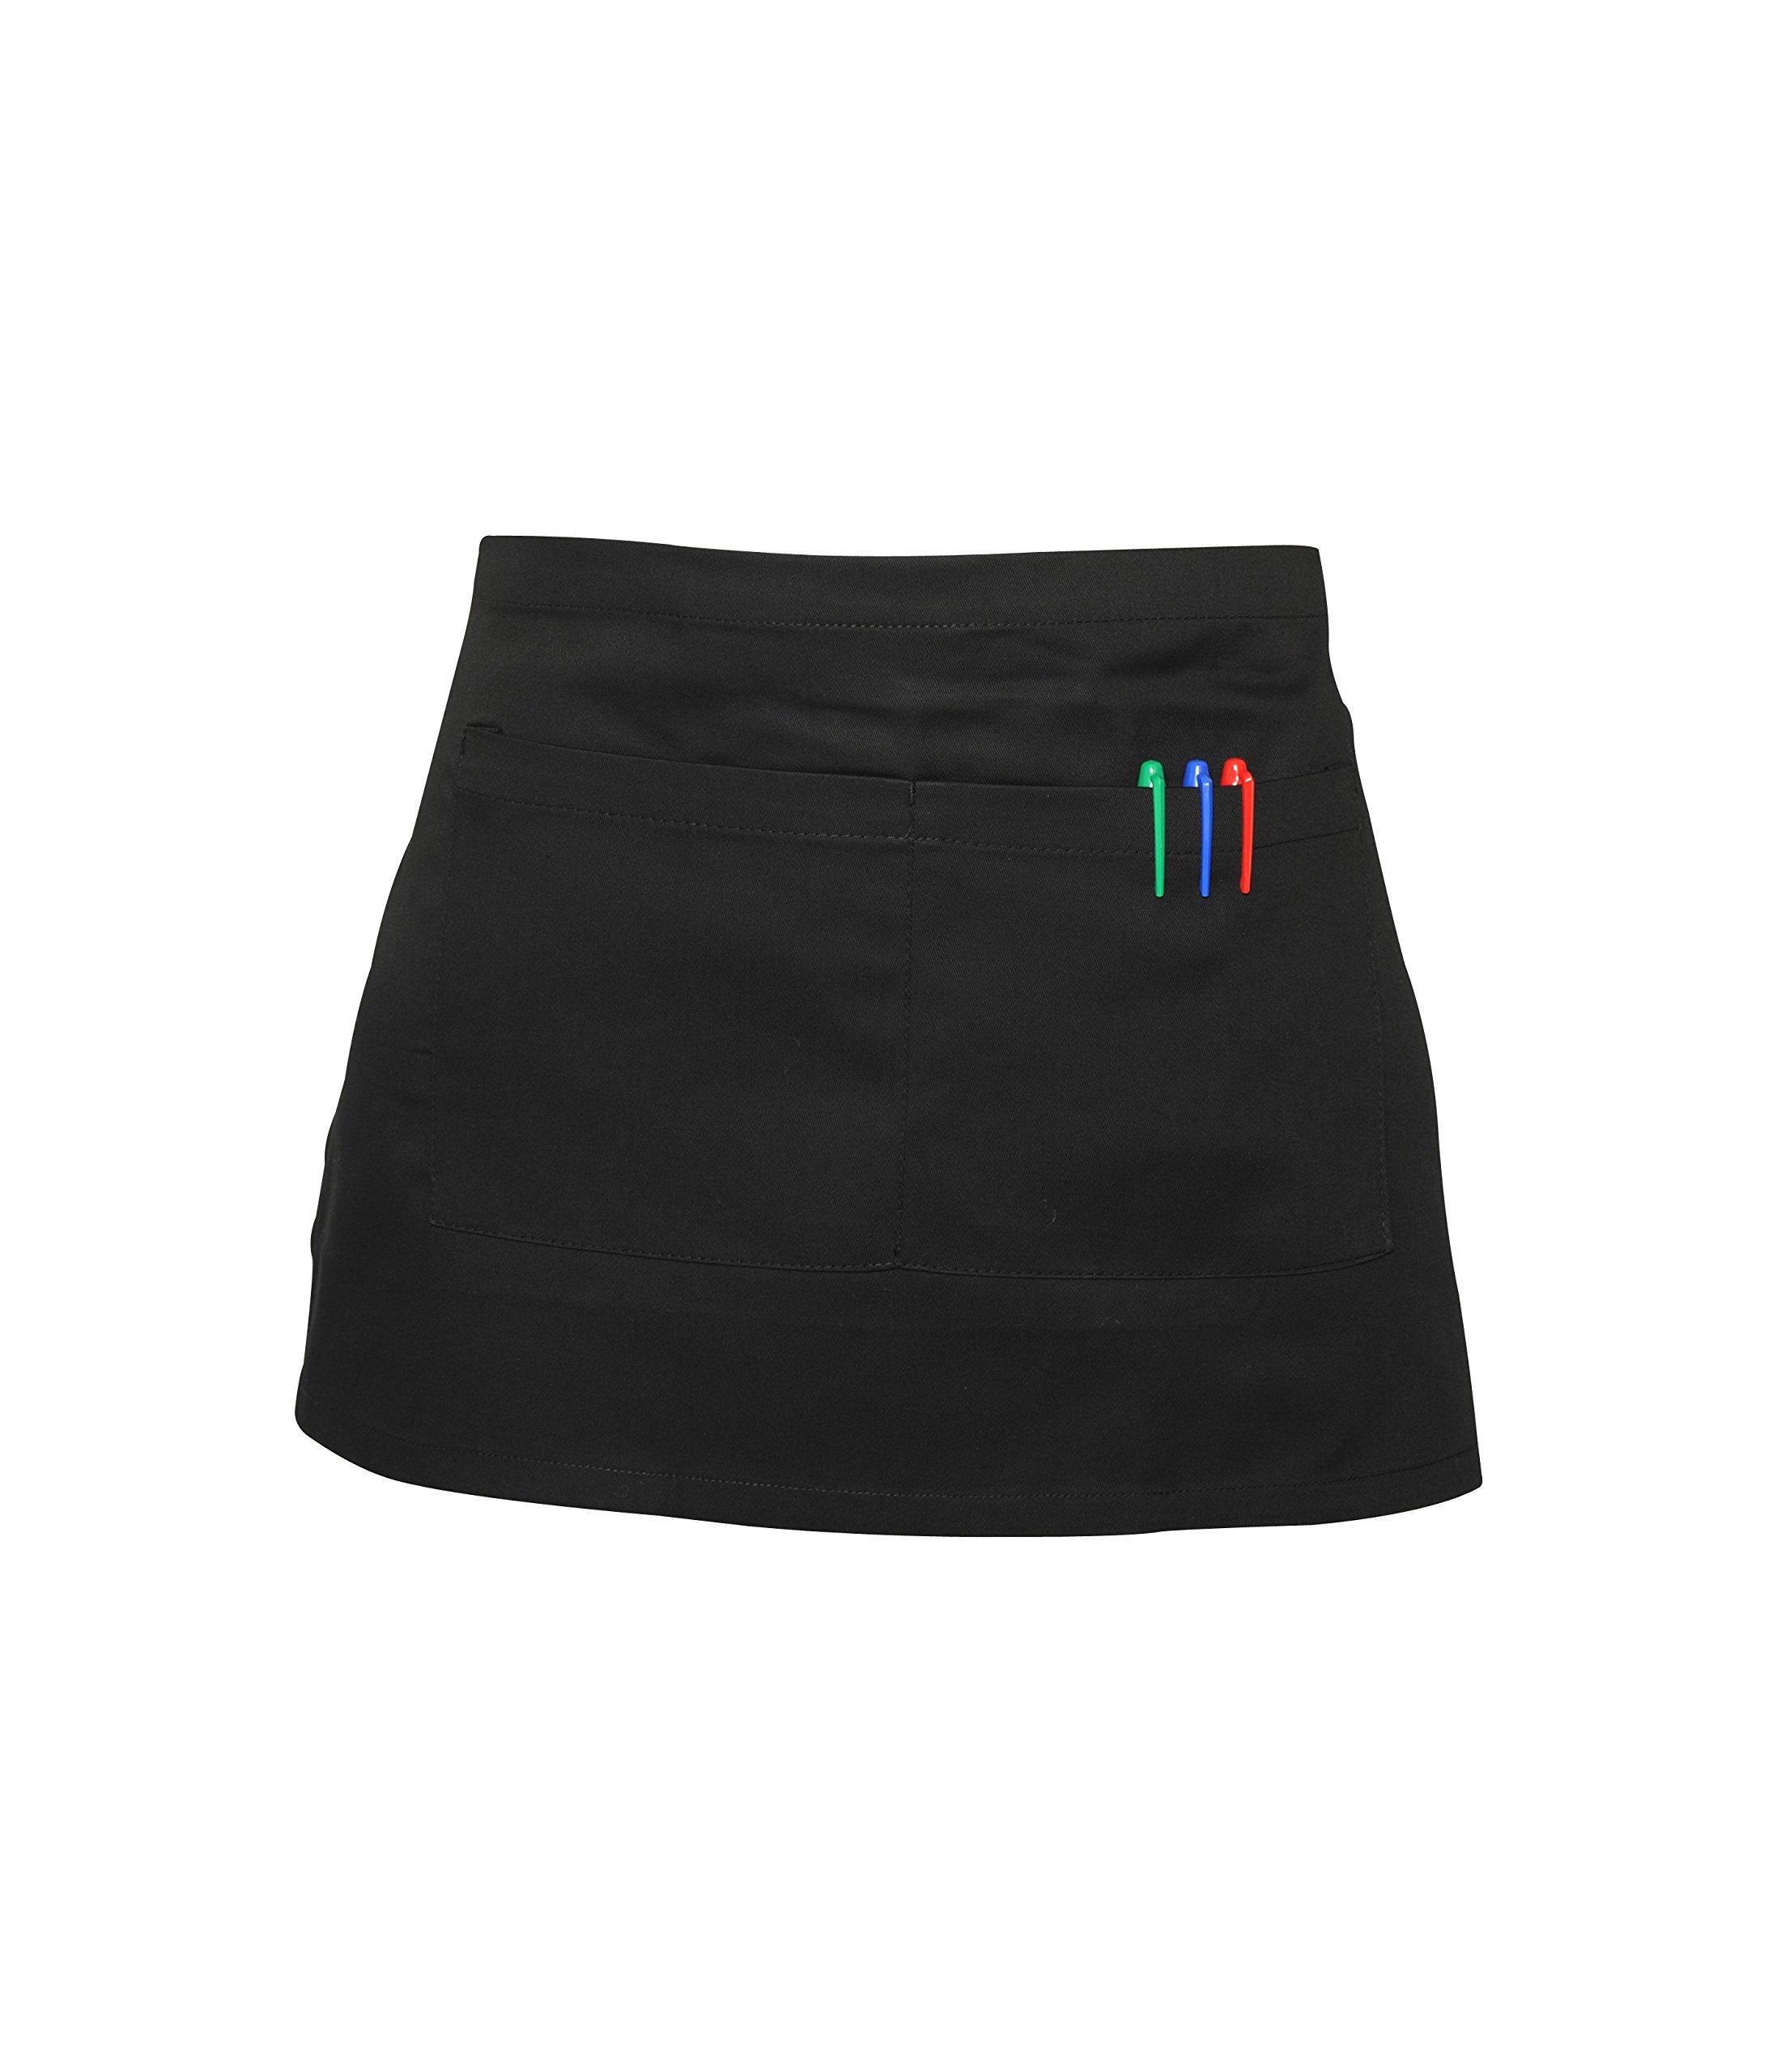 Premier Unisex Chefs Butchers Cooking Tabard Short Style Colours 3 Pocket Apron